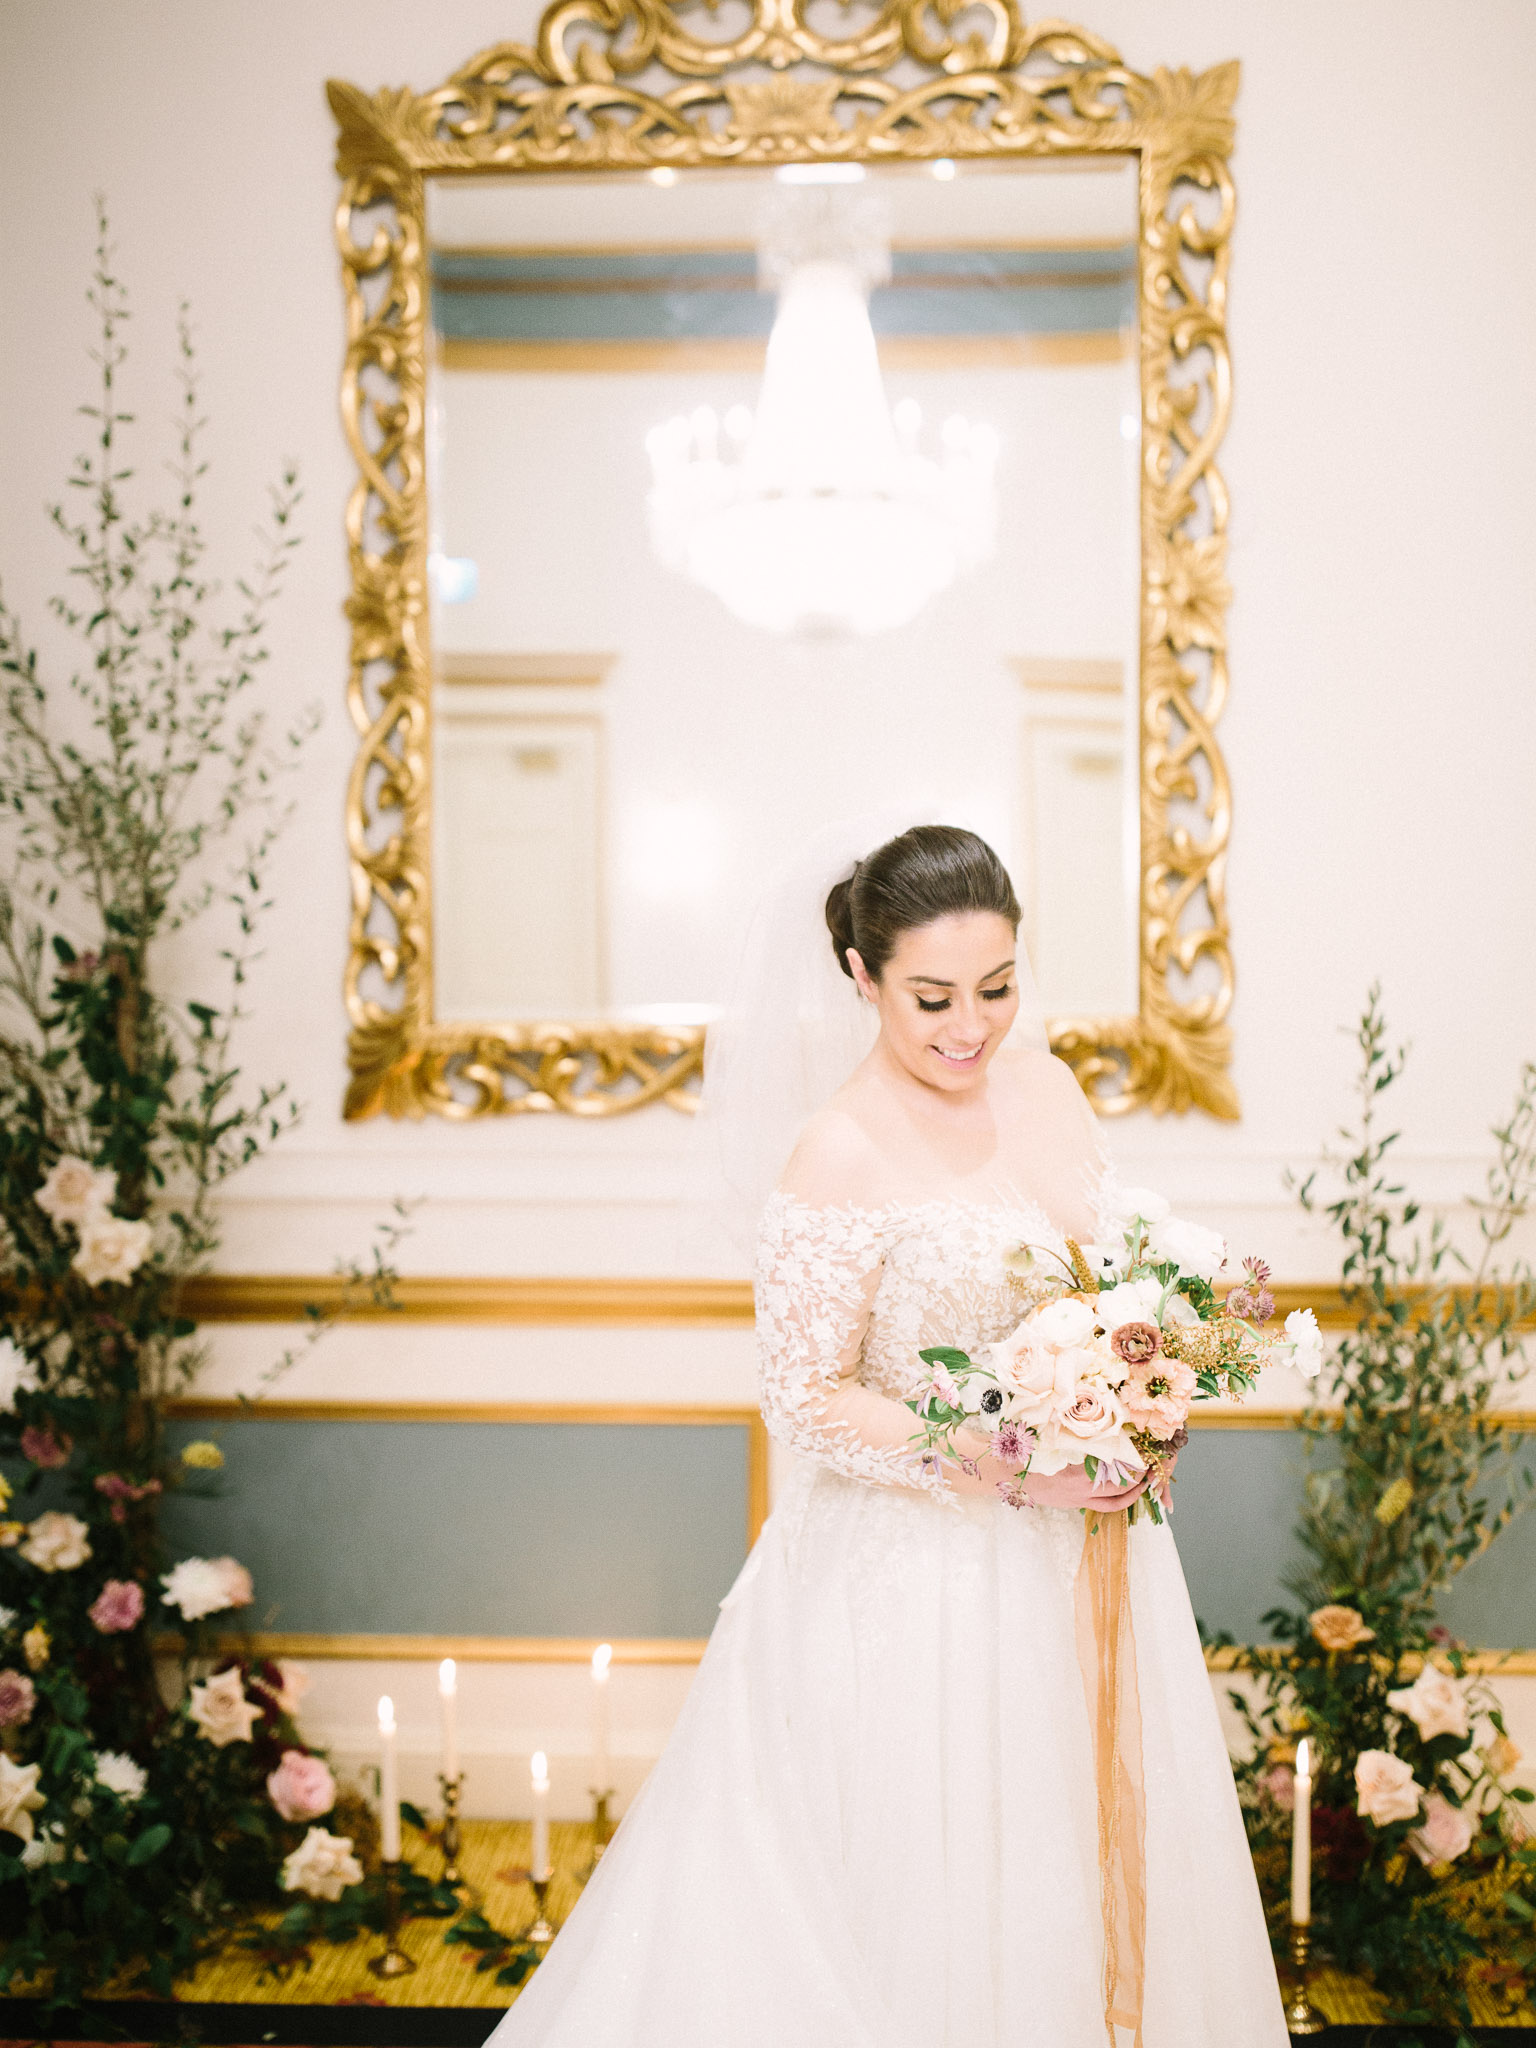 Hanna&Jordan Wedding_HotelVancouver_9412.jpg